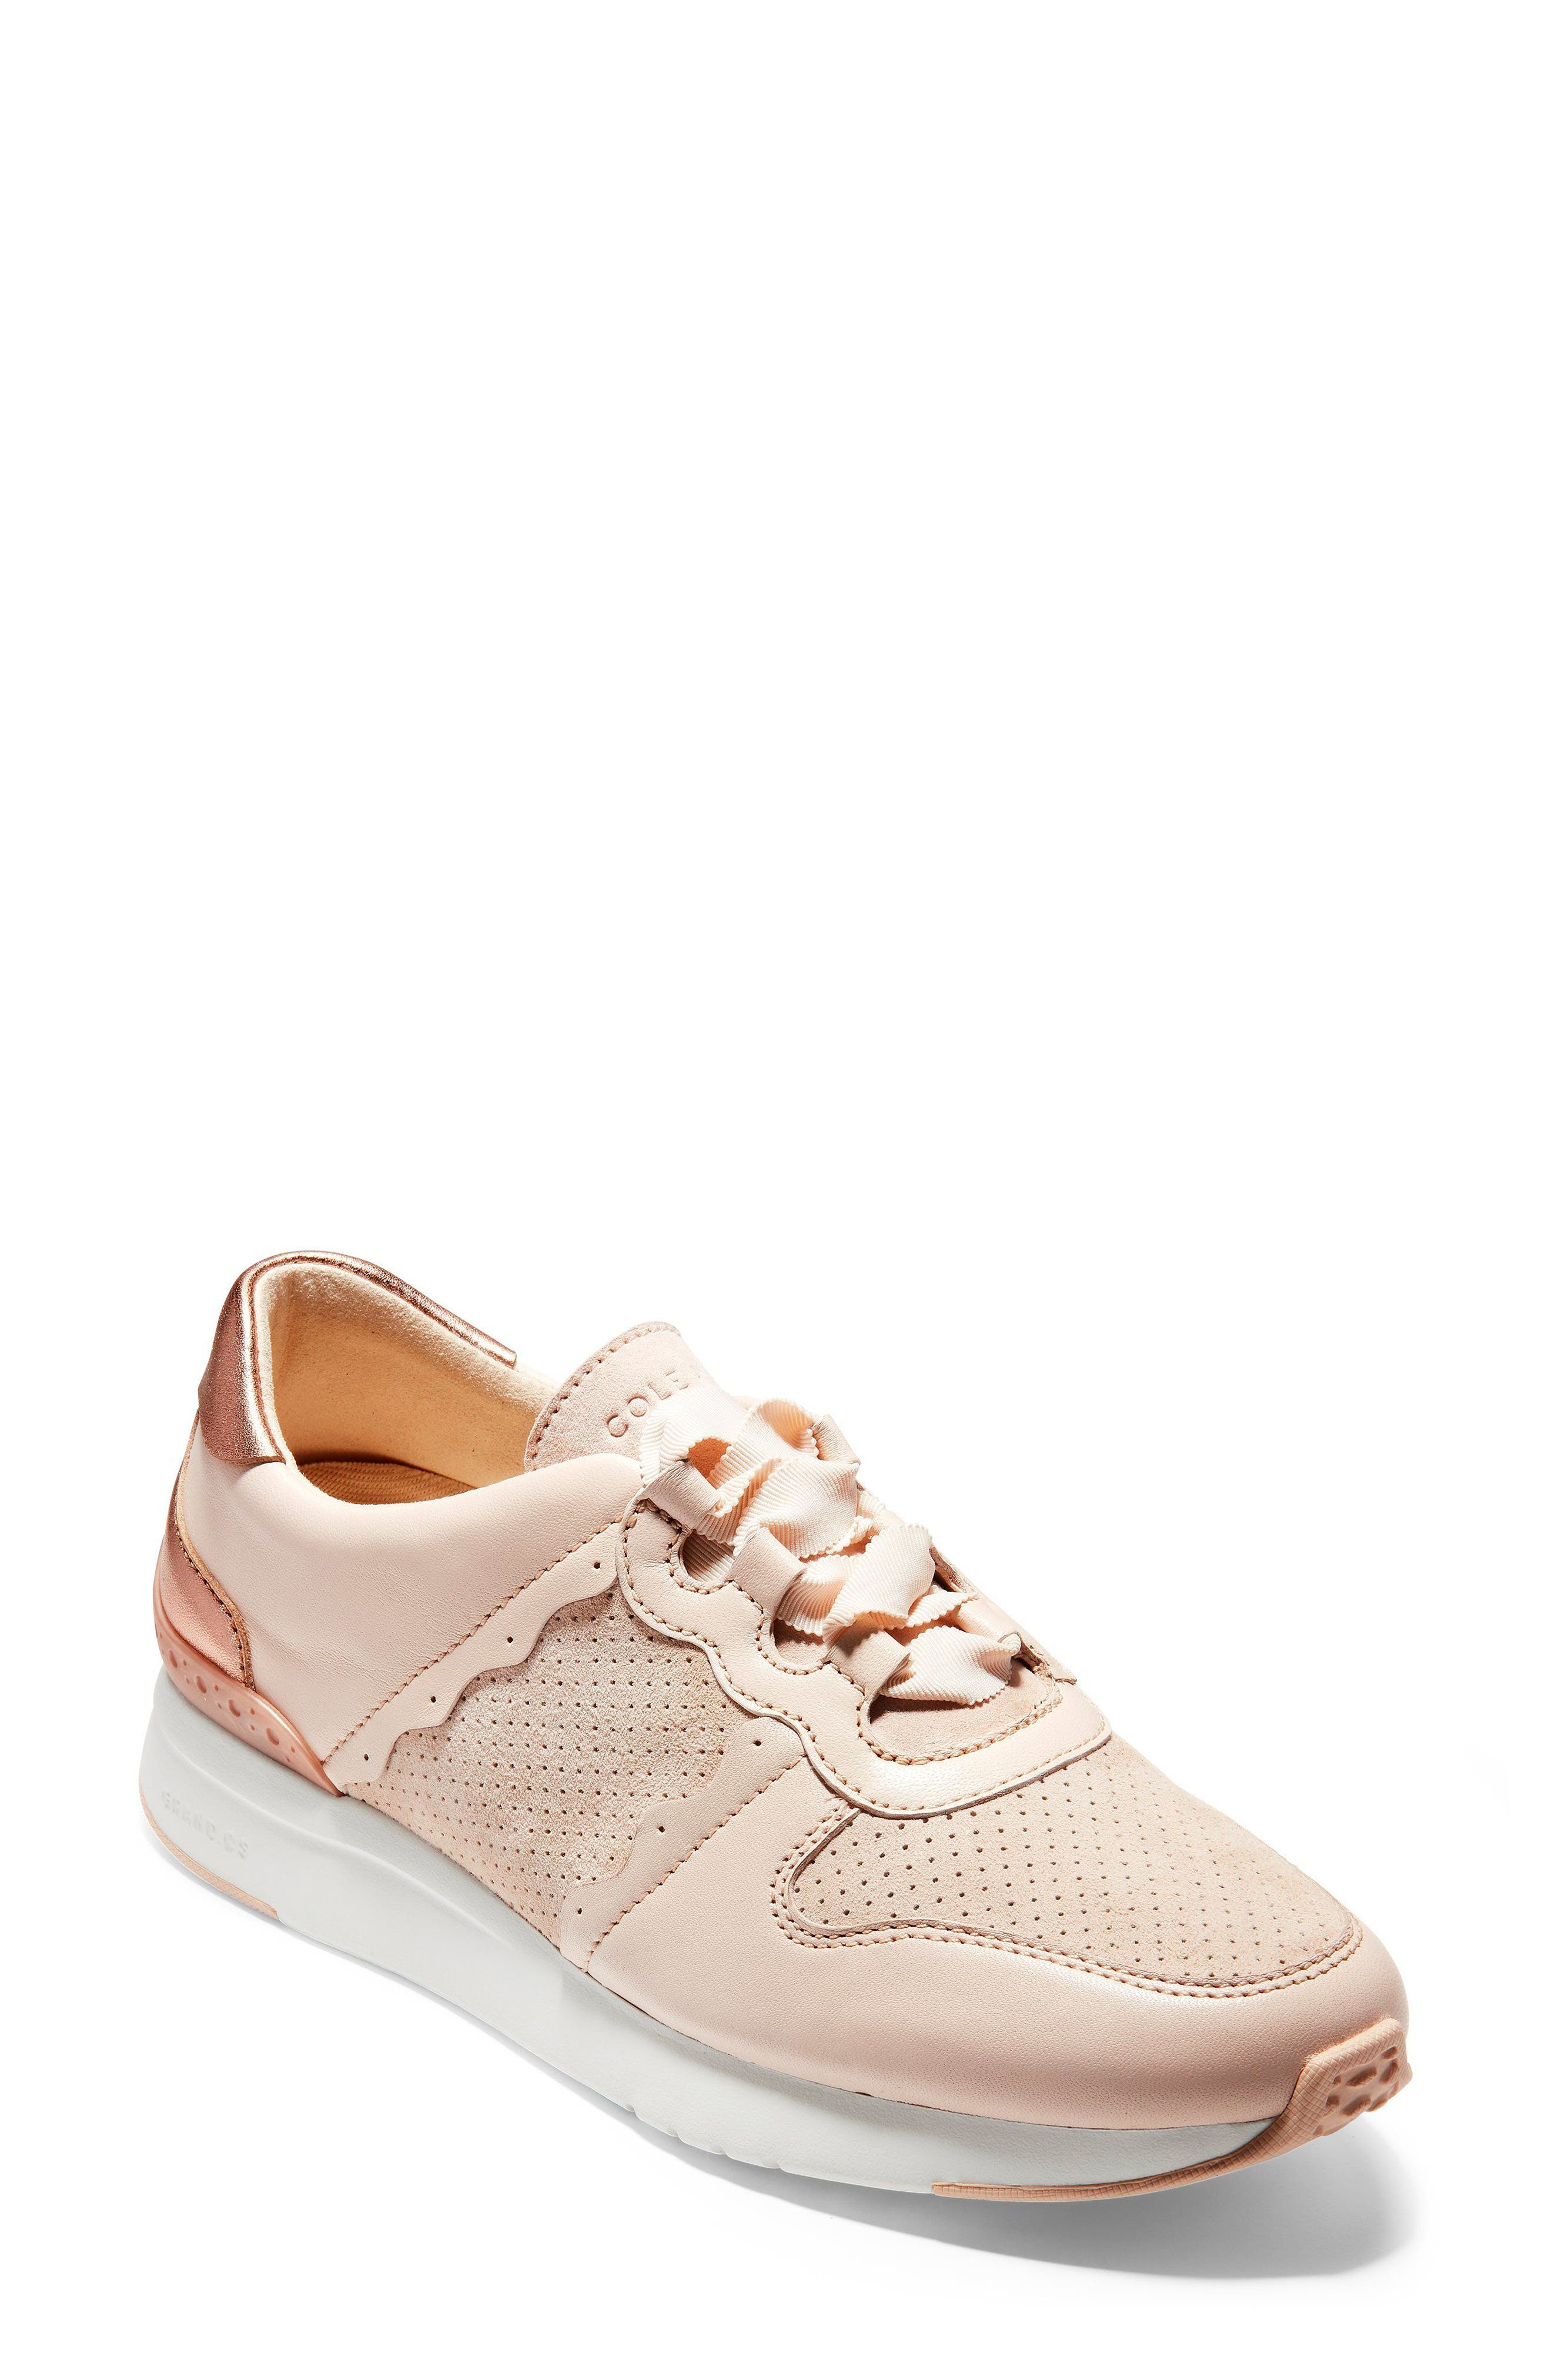 GrandPro Wedge Sneaker,                         Main,                         color, Peach Blush Suede